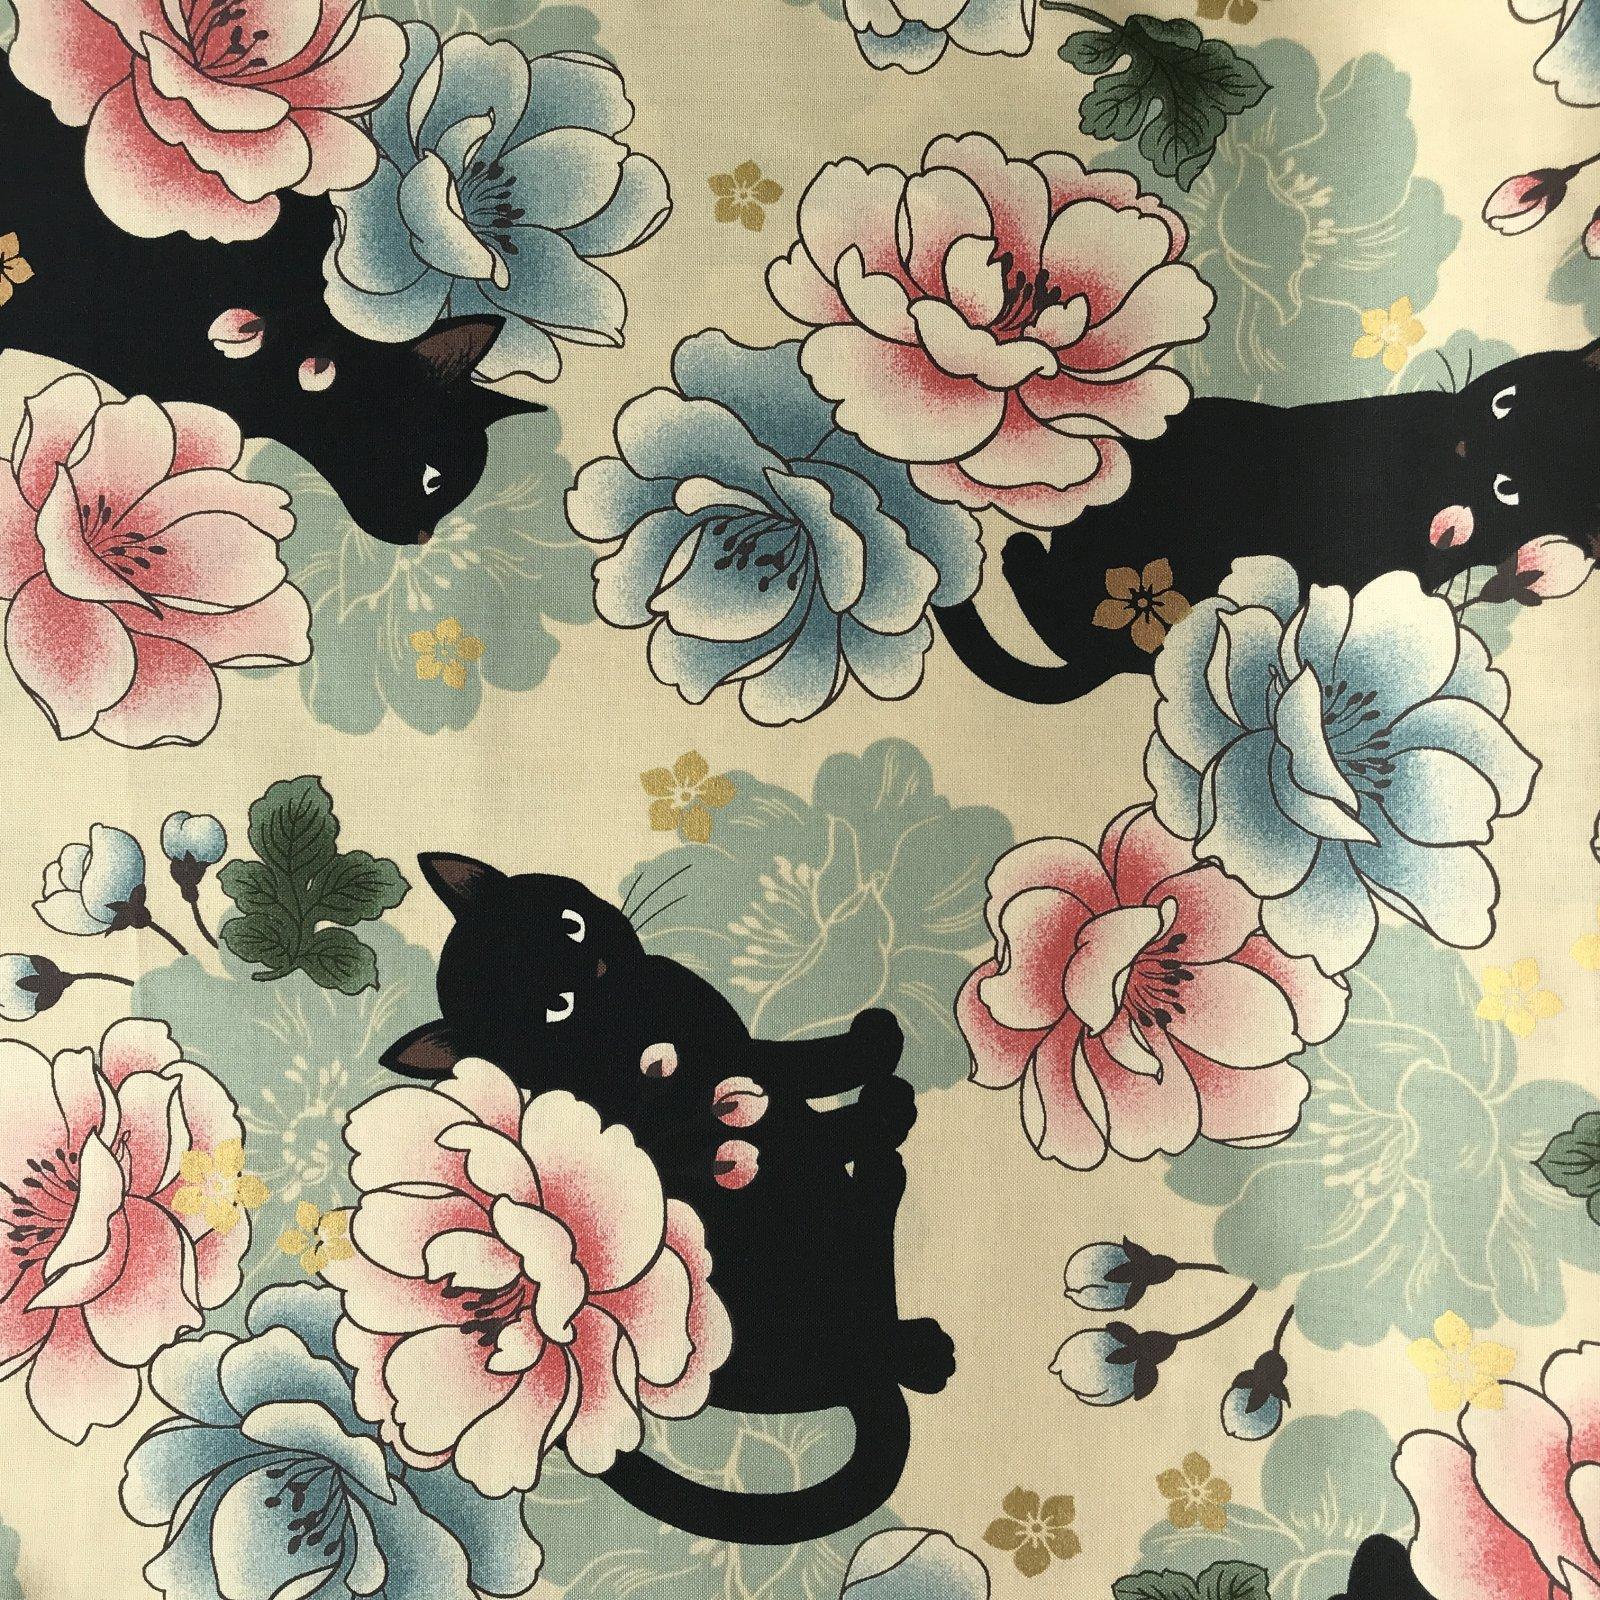 Neko- Hyakka Ryoran- Quilt Gate- Large Kitty Floral- Cream